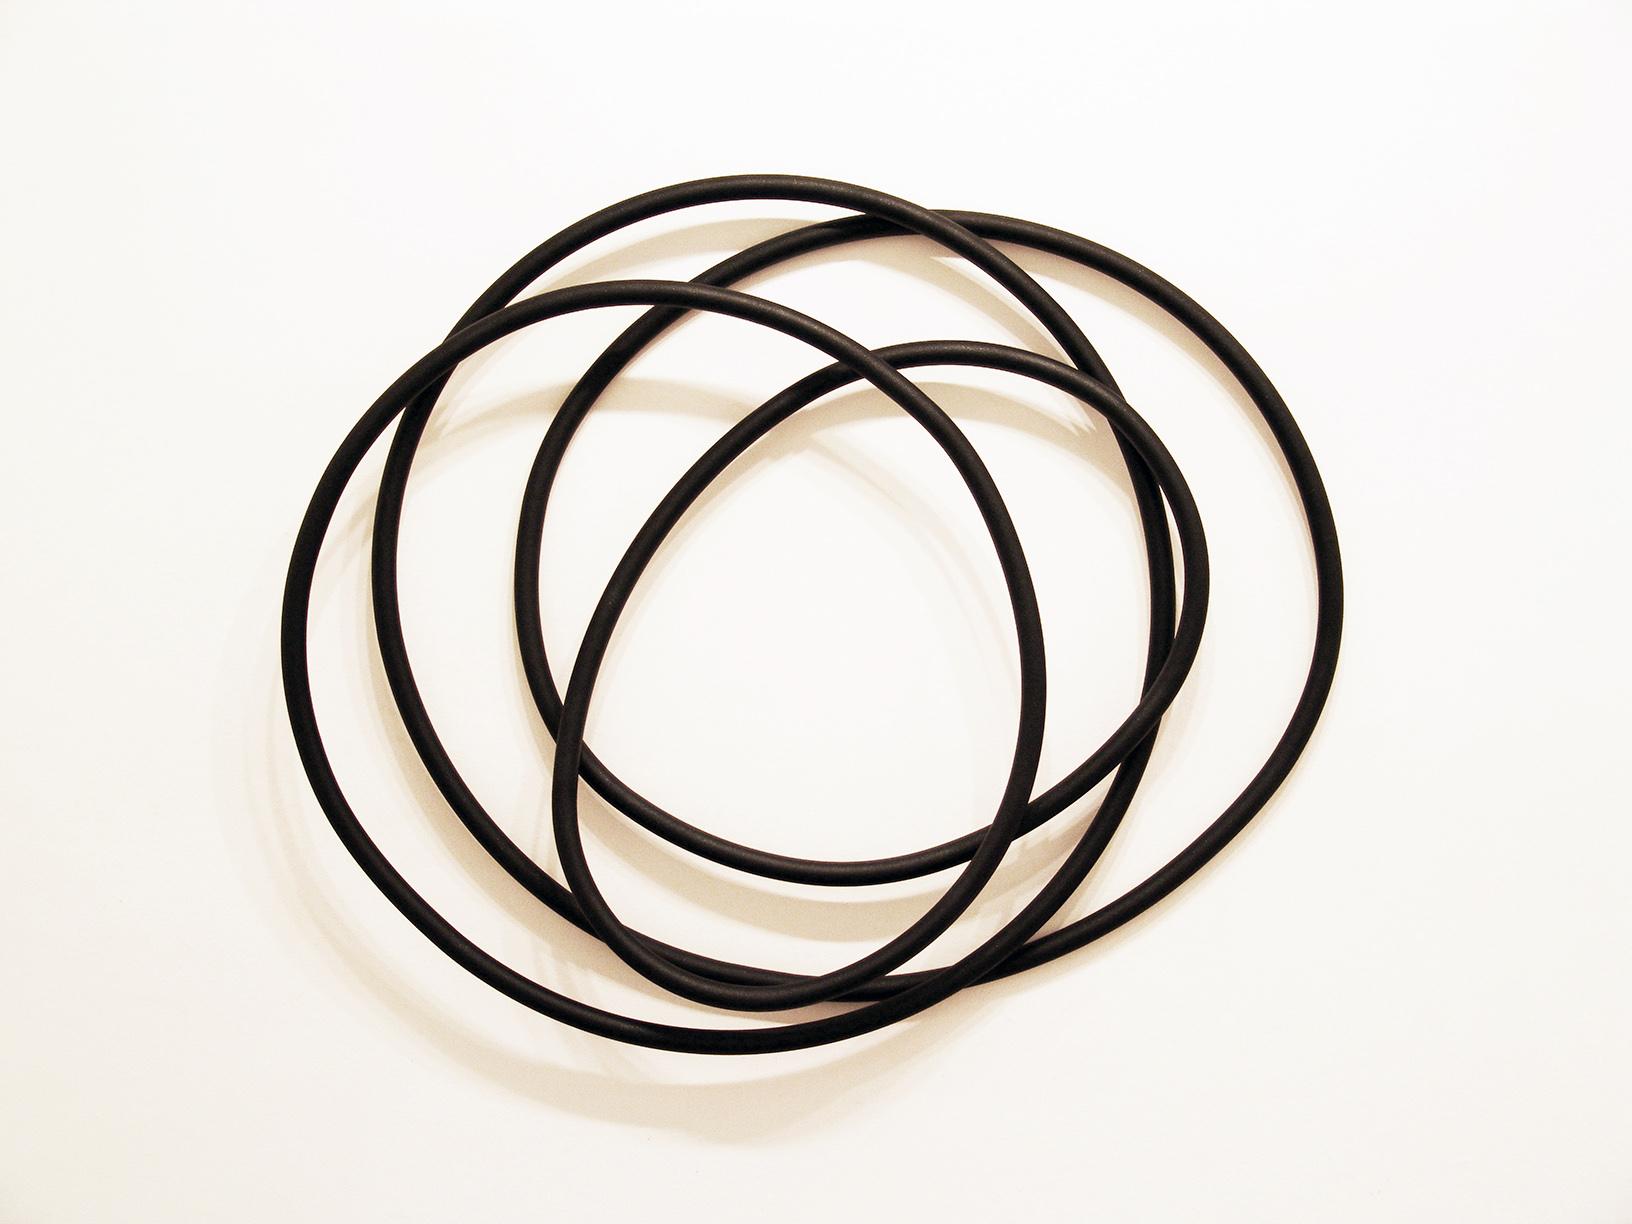 Curvas elípticas (2007) - Diego Canogar